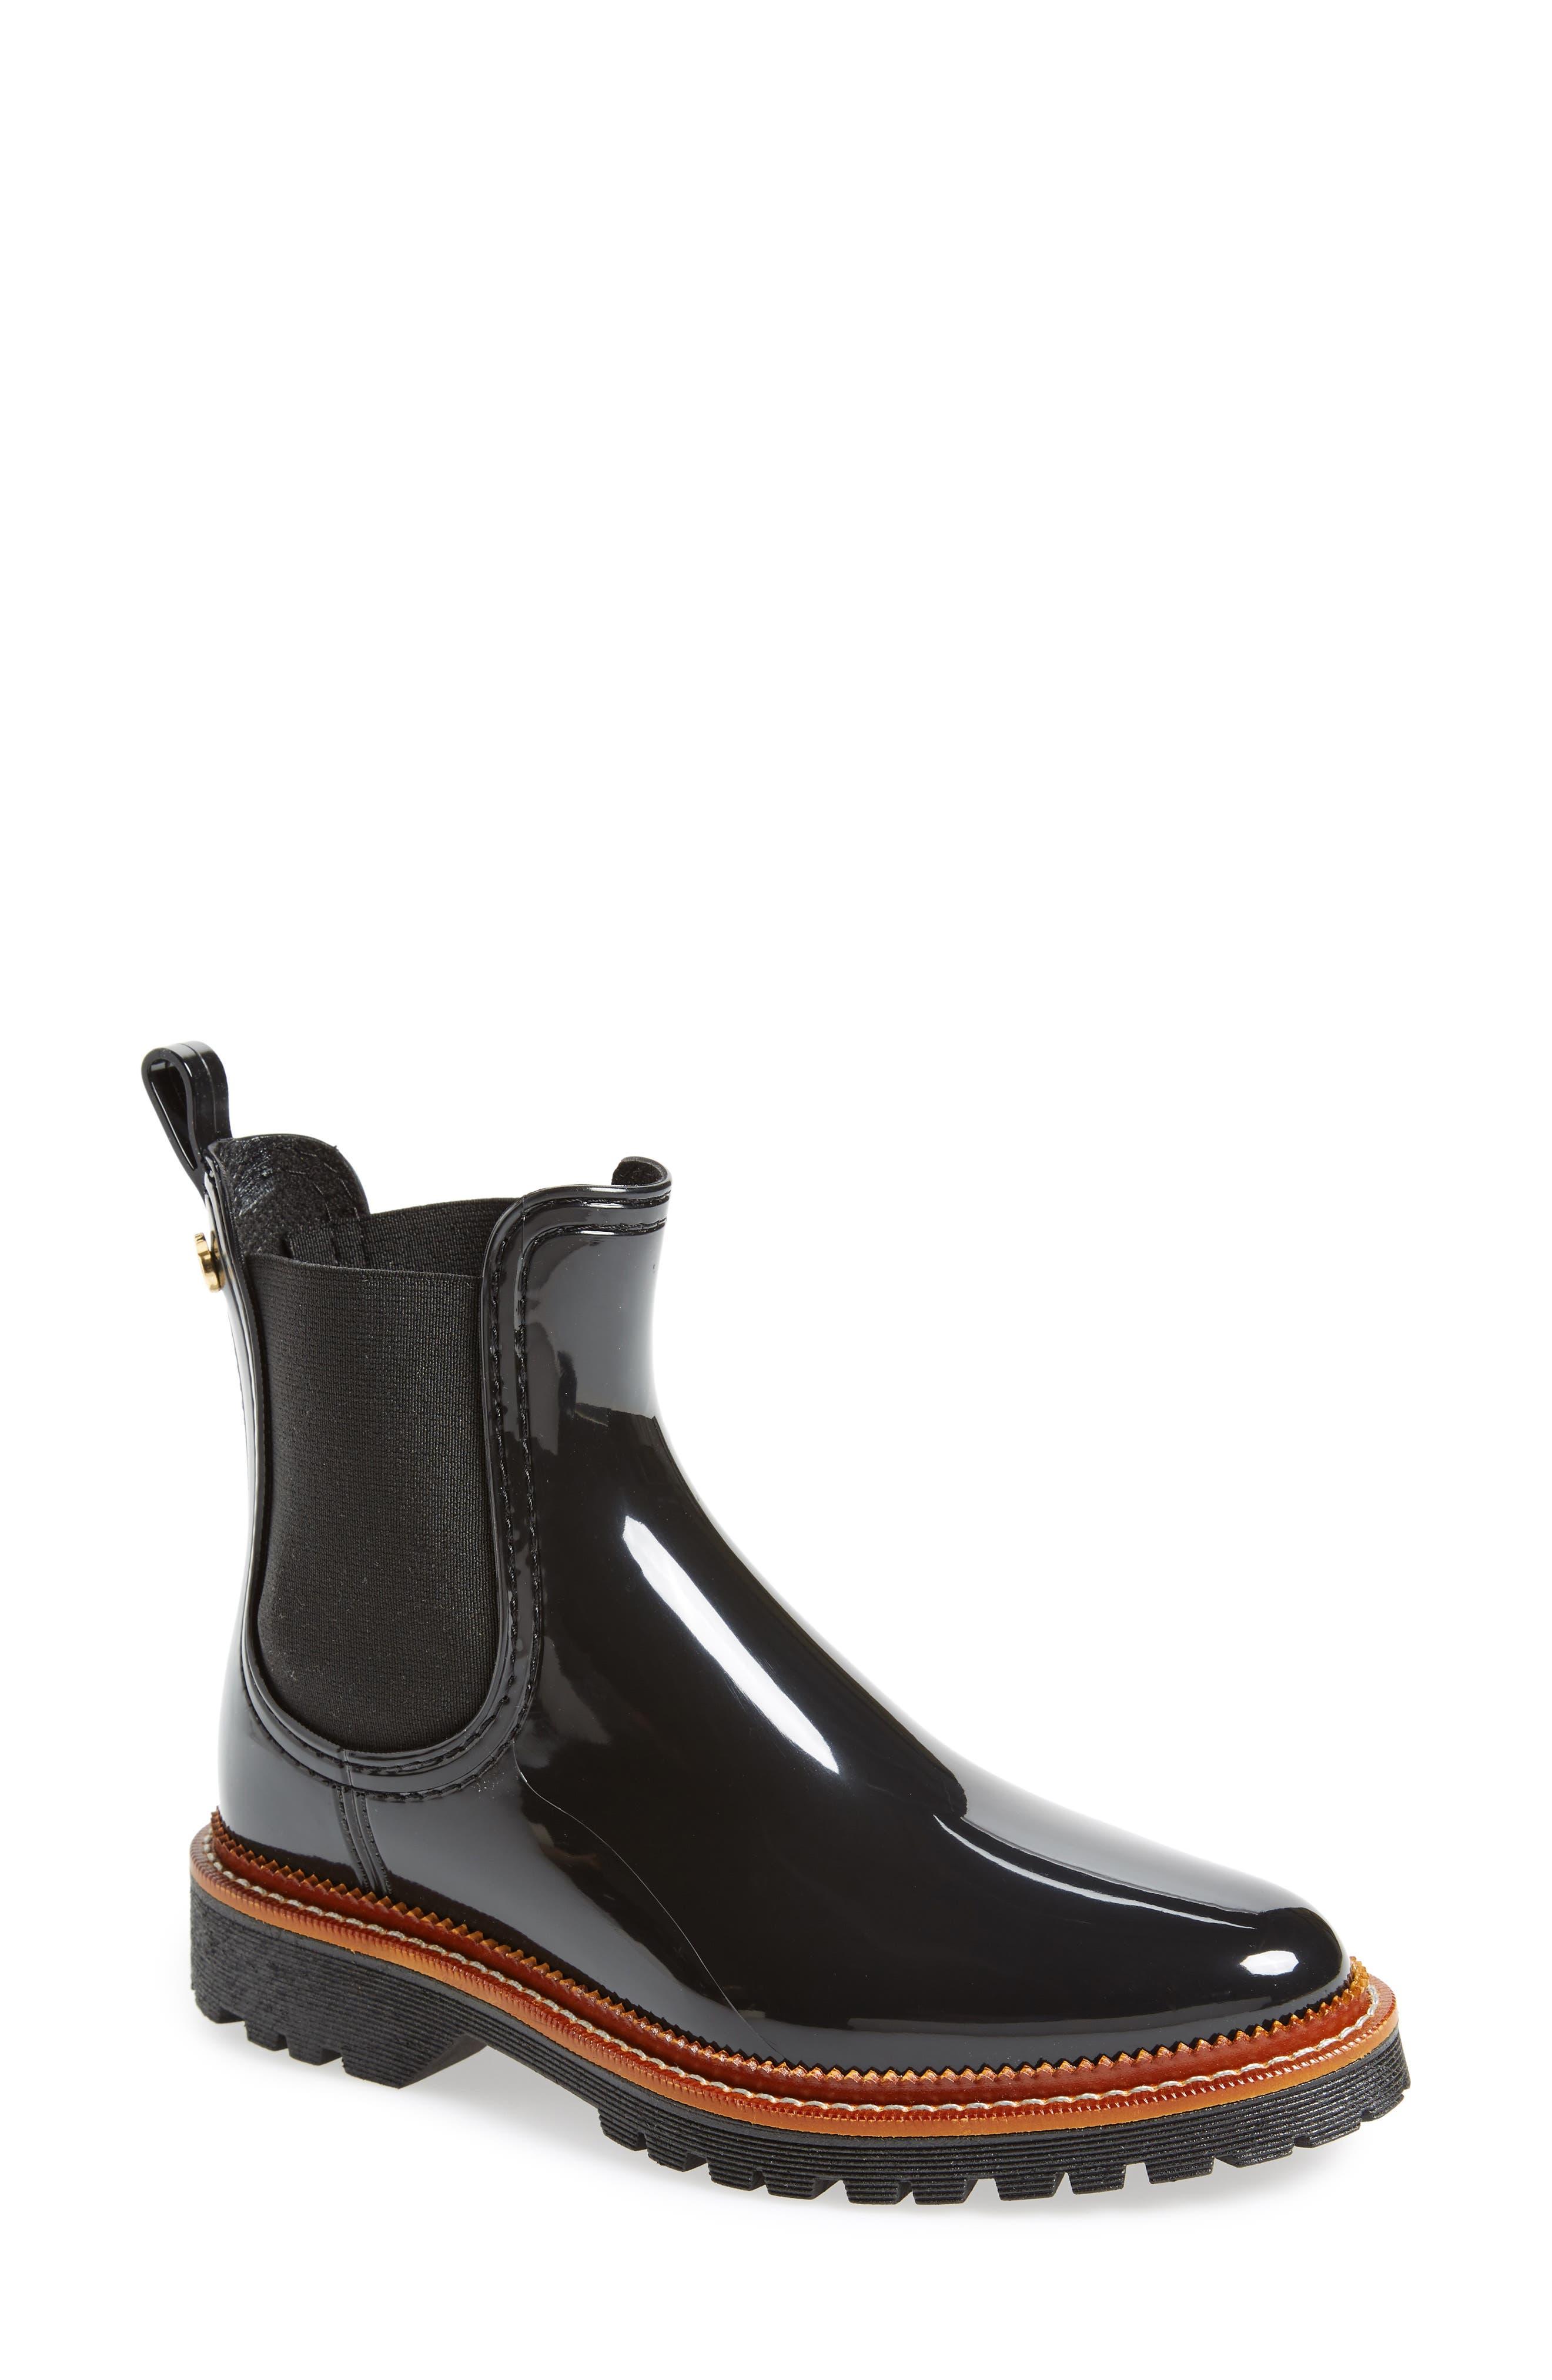 April Waterproof Chelsea Boot,                             Main thumbnail 1, color,                             Black Gloss